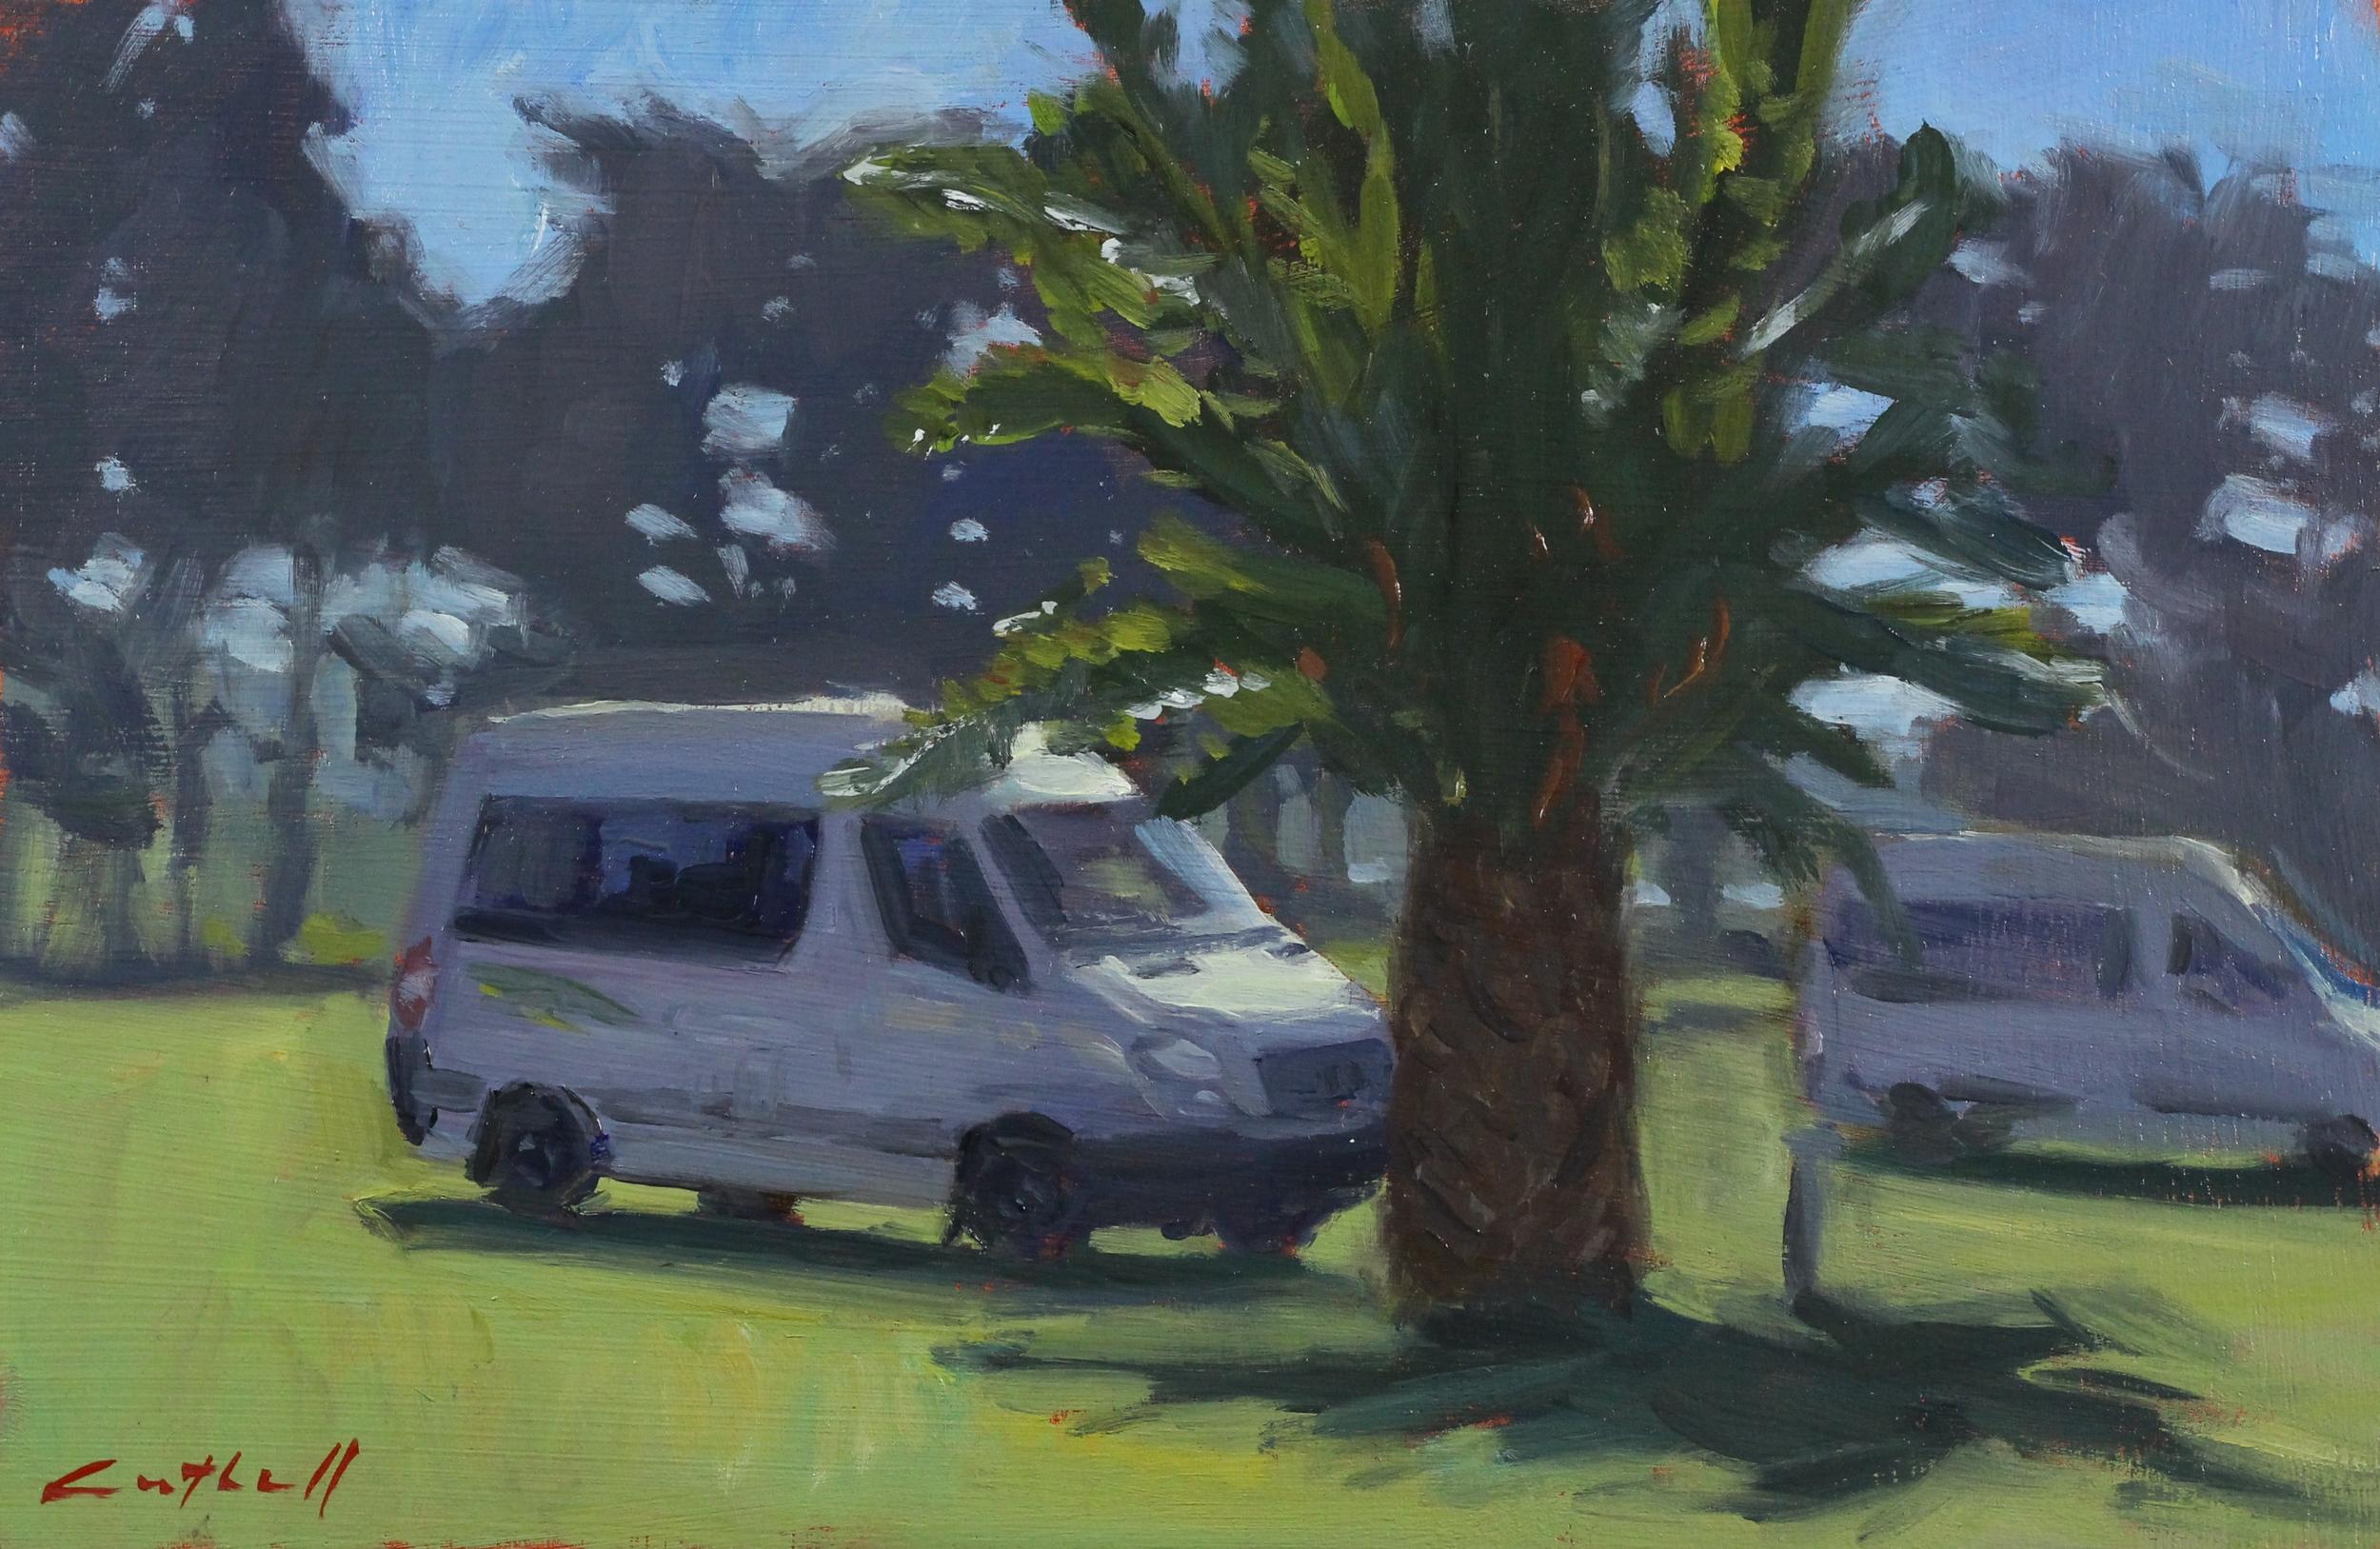 Tolaga Bay Holiday Park Sketch, Oil on Board, 20 x 30cm, 2015